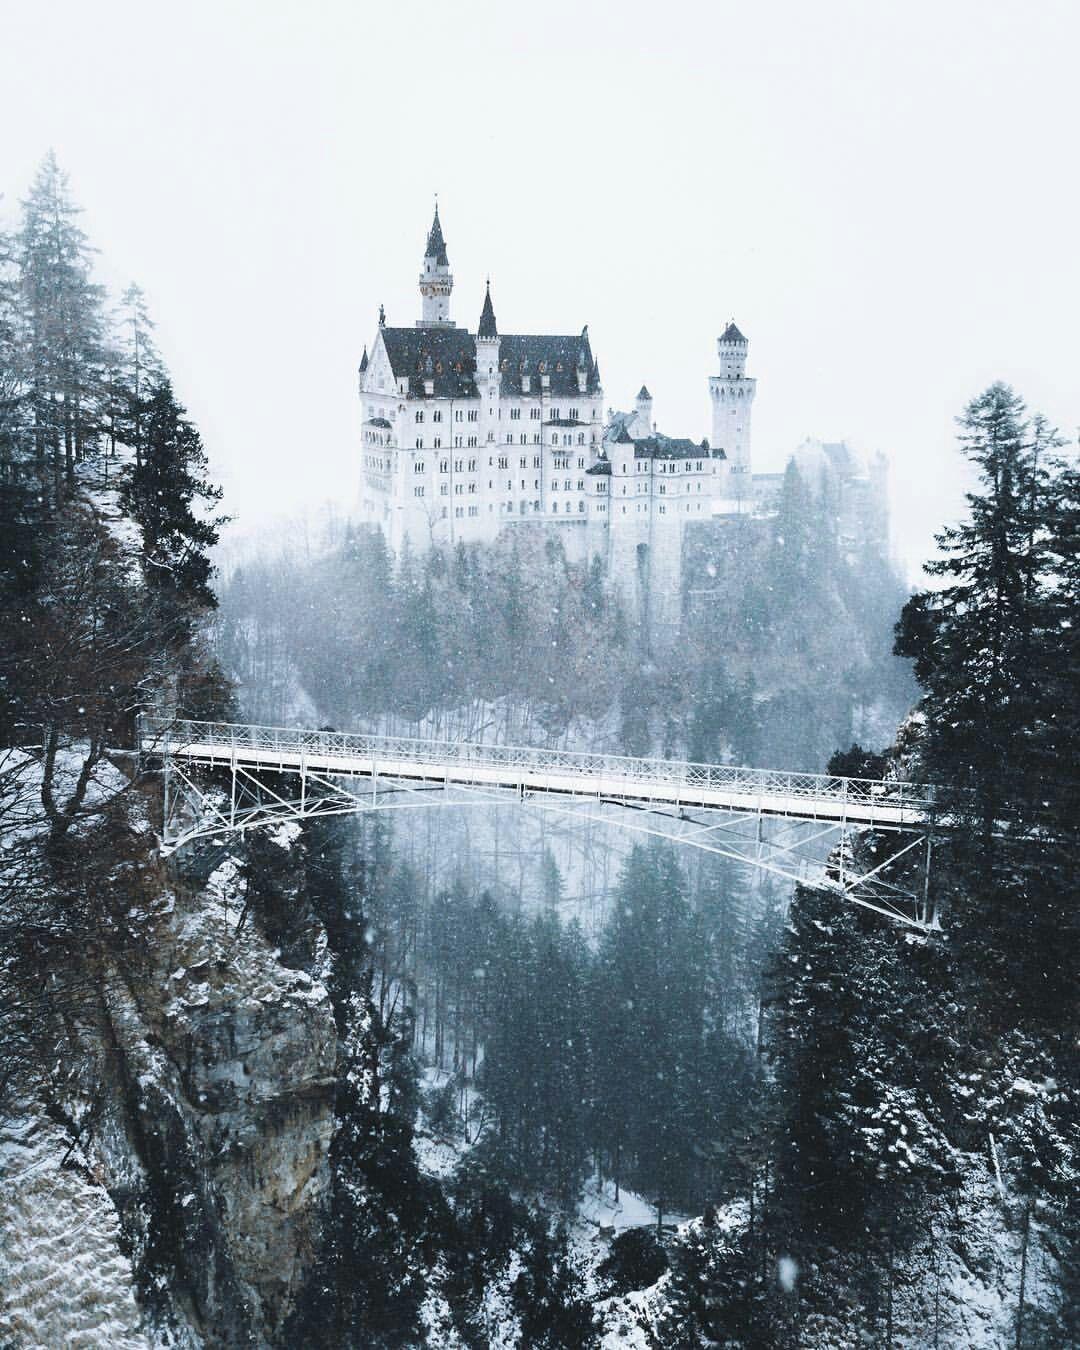 Neuschwanstein Castle Germany Germany Castles Neuschwanstein Castle Castle